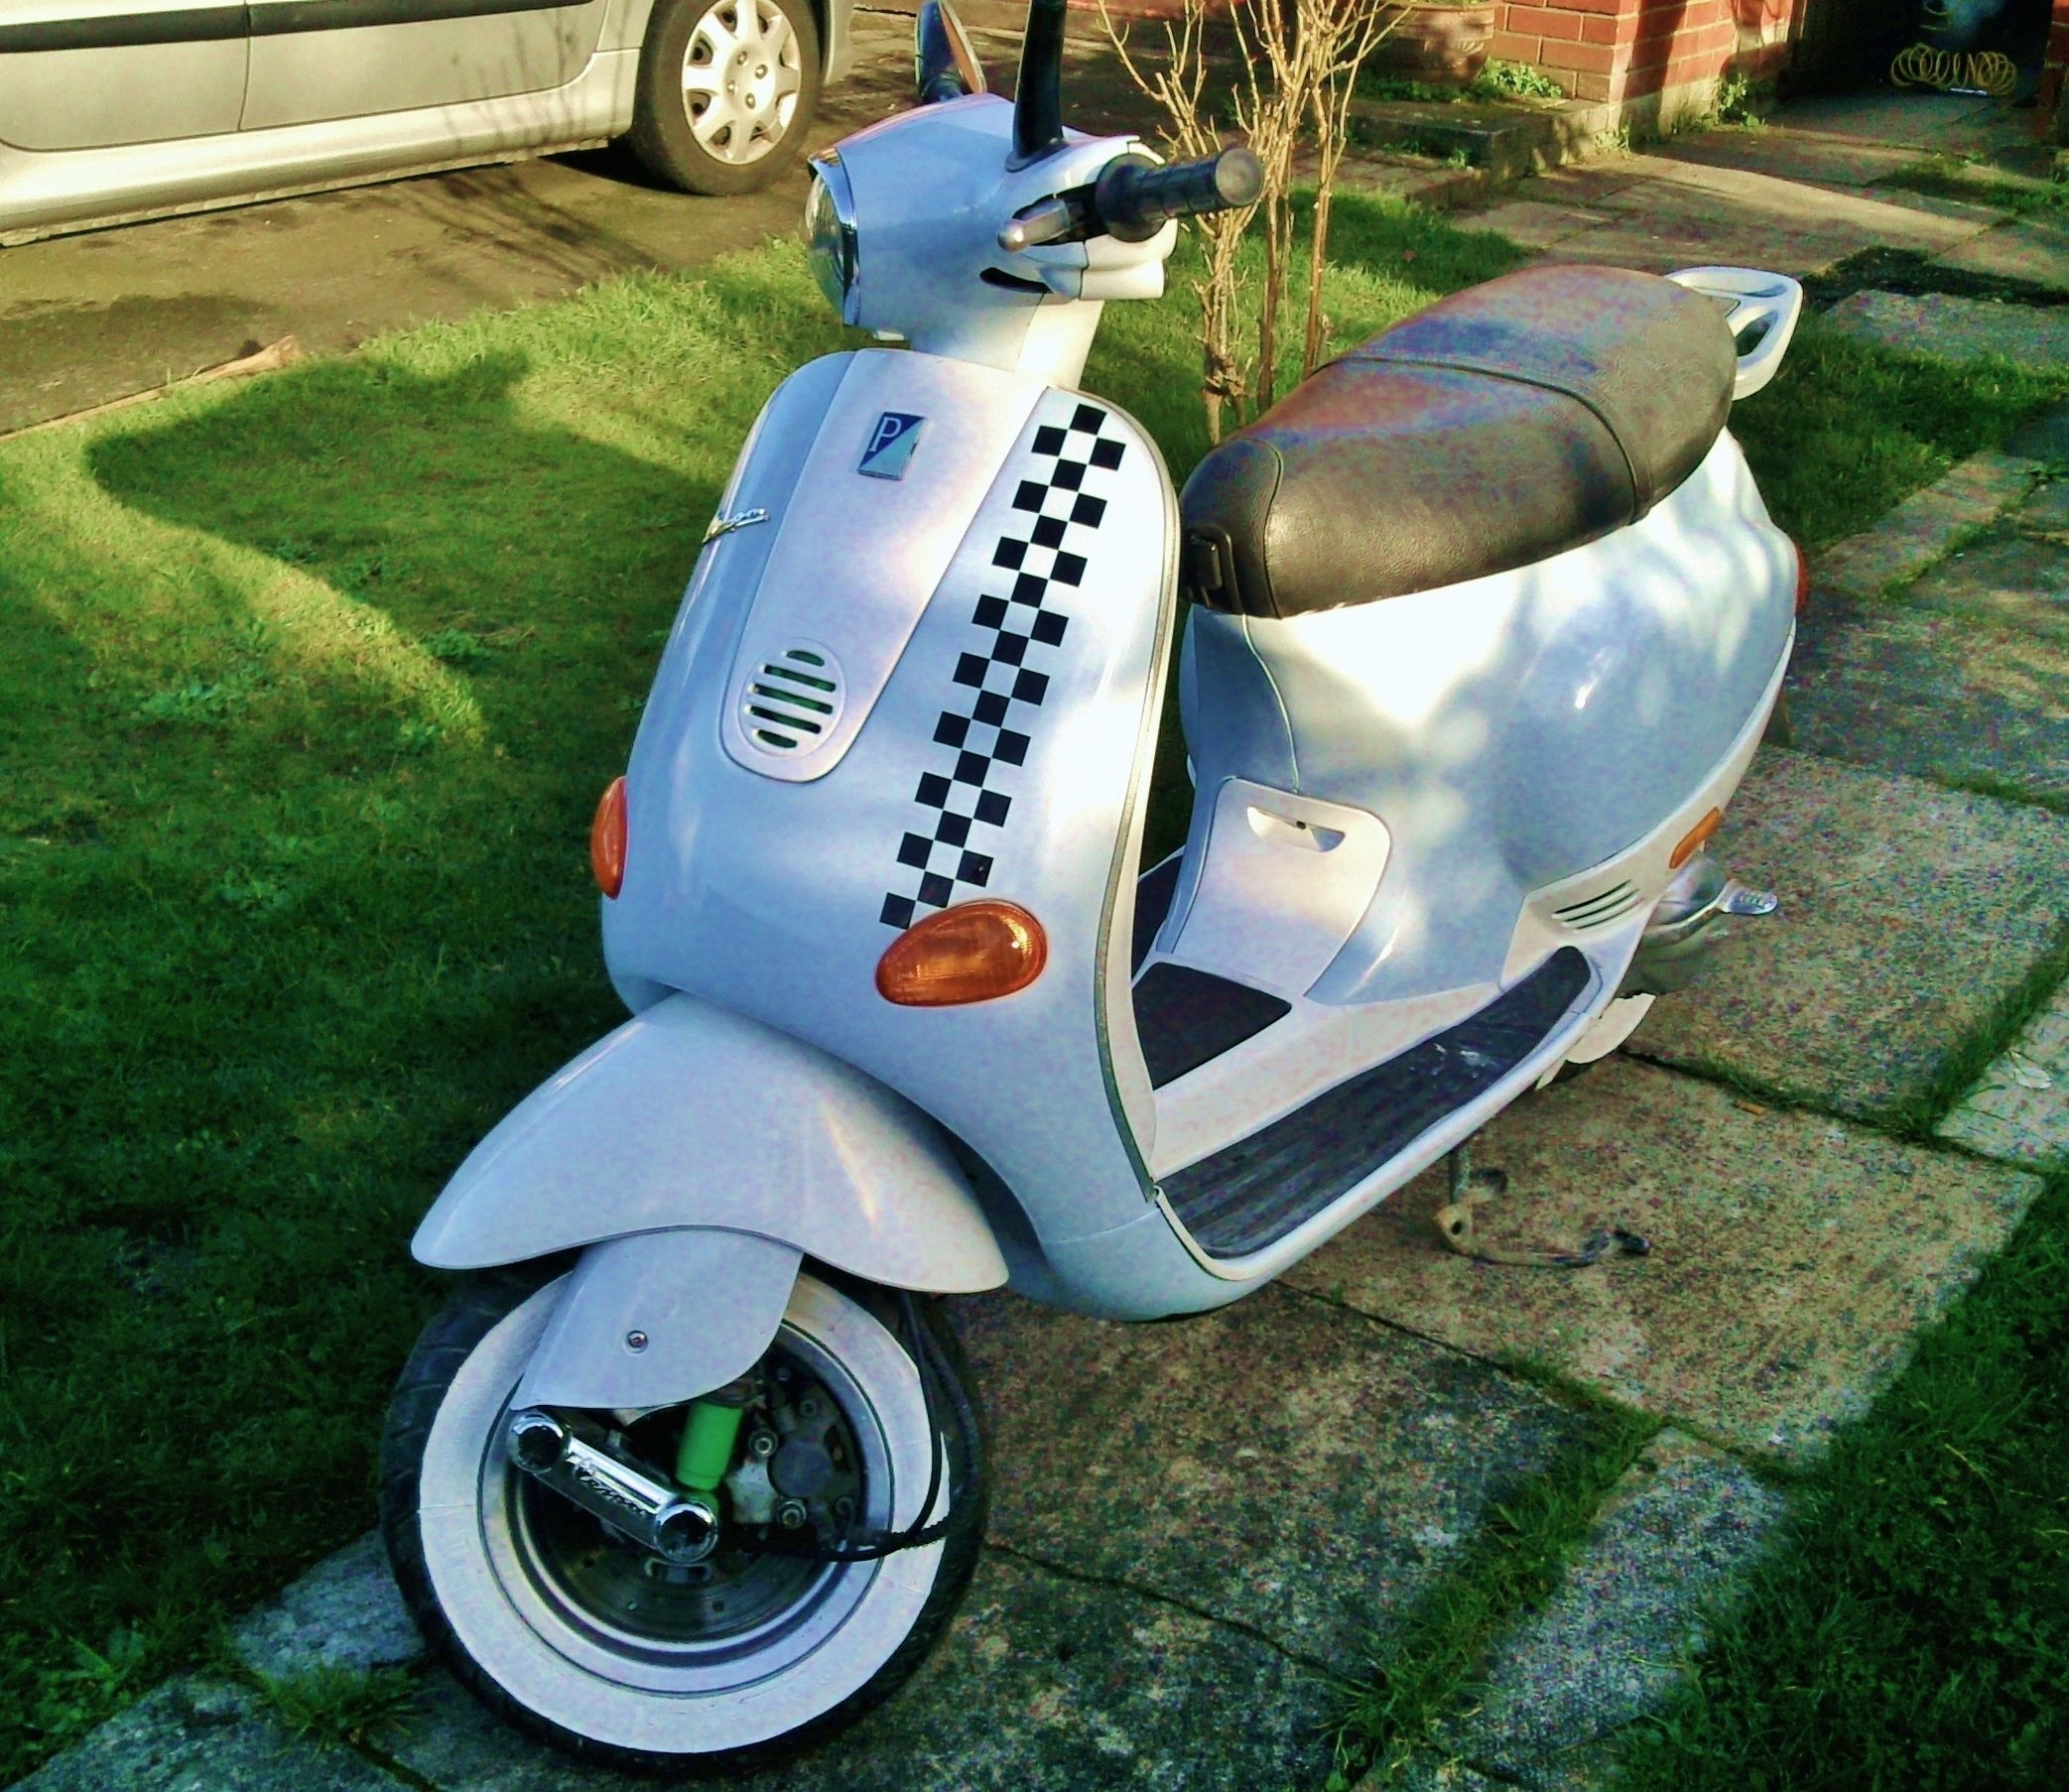 Et2 50cc light blue and white 750 bournemouth